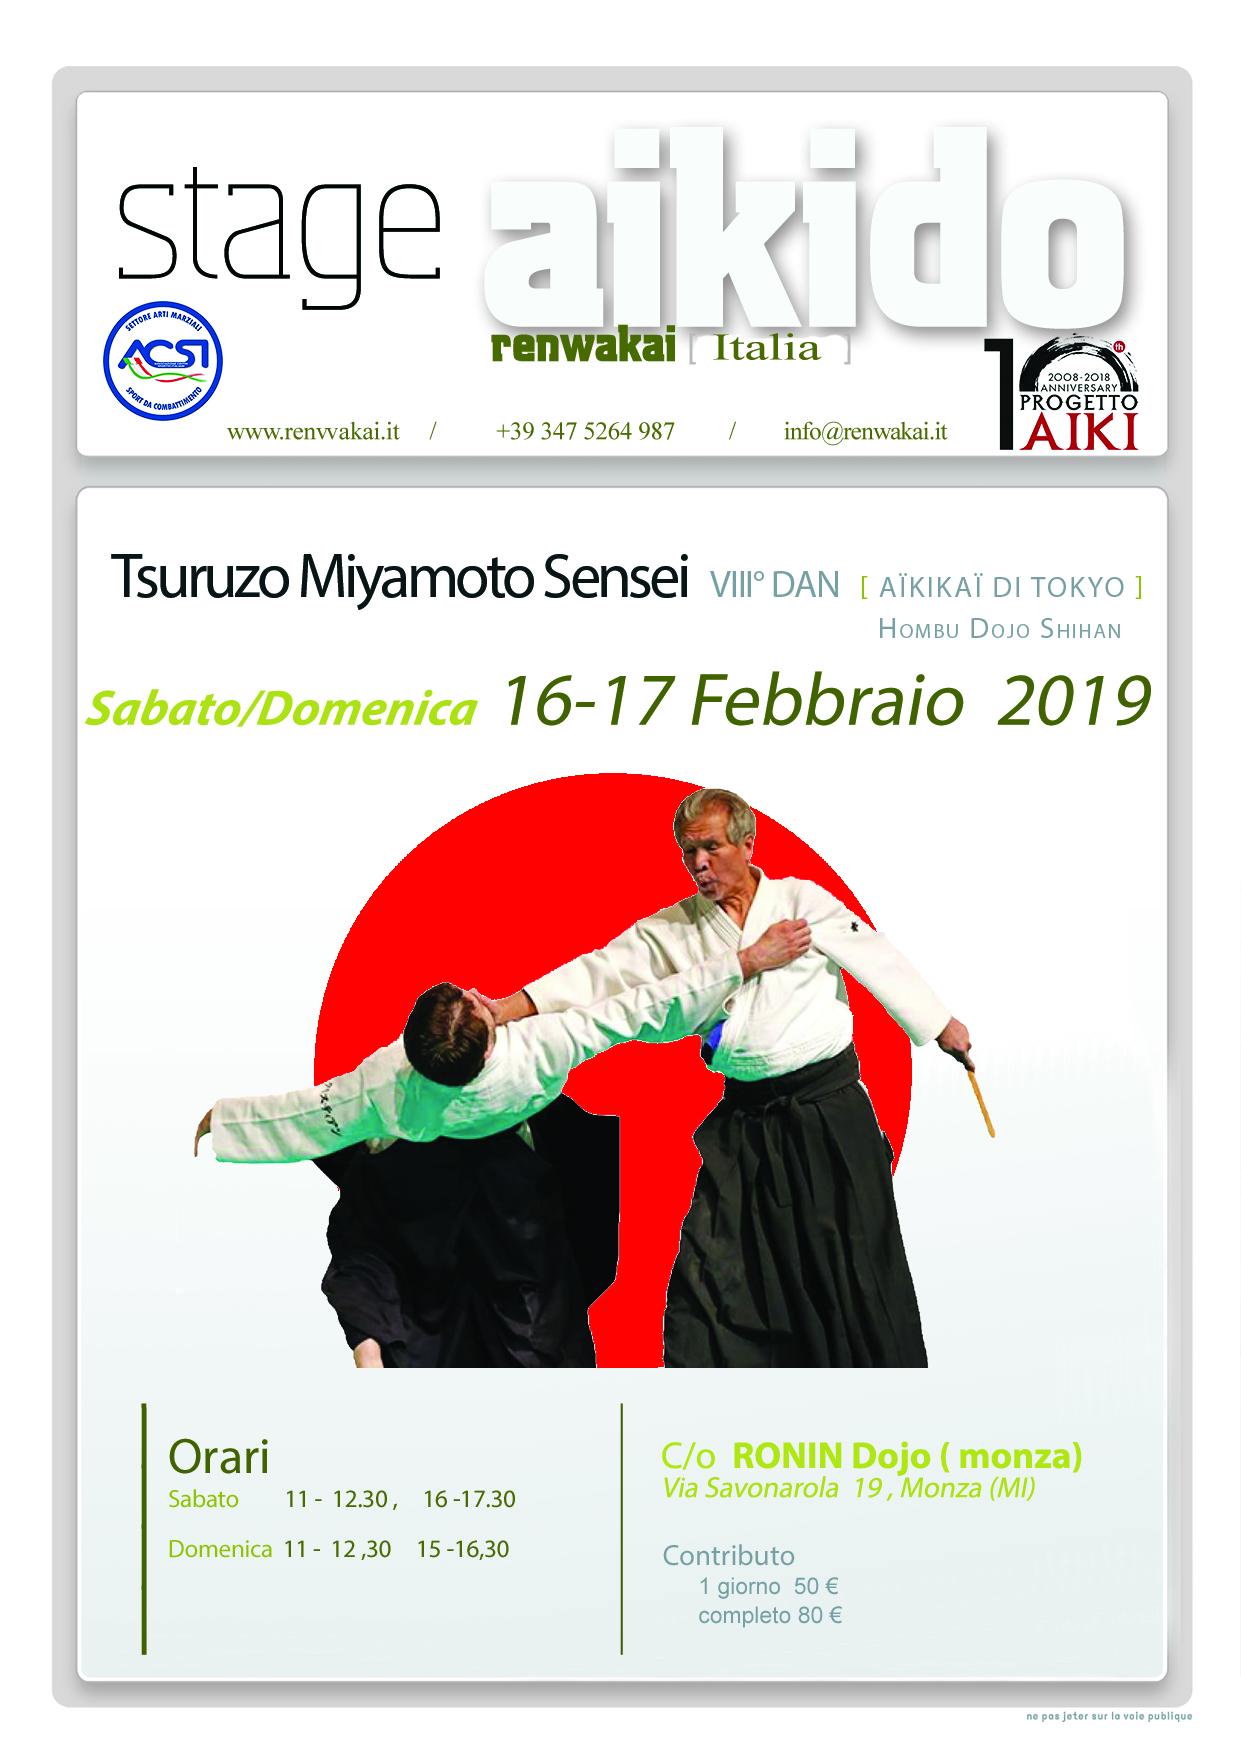 Stage di Aikido, Tsuruzo Miyamoto, Monza, Aikido RWK